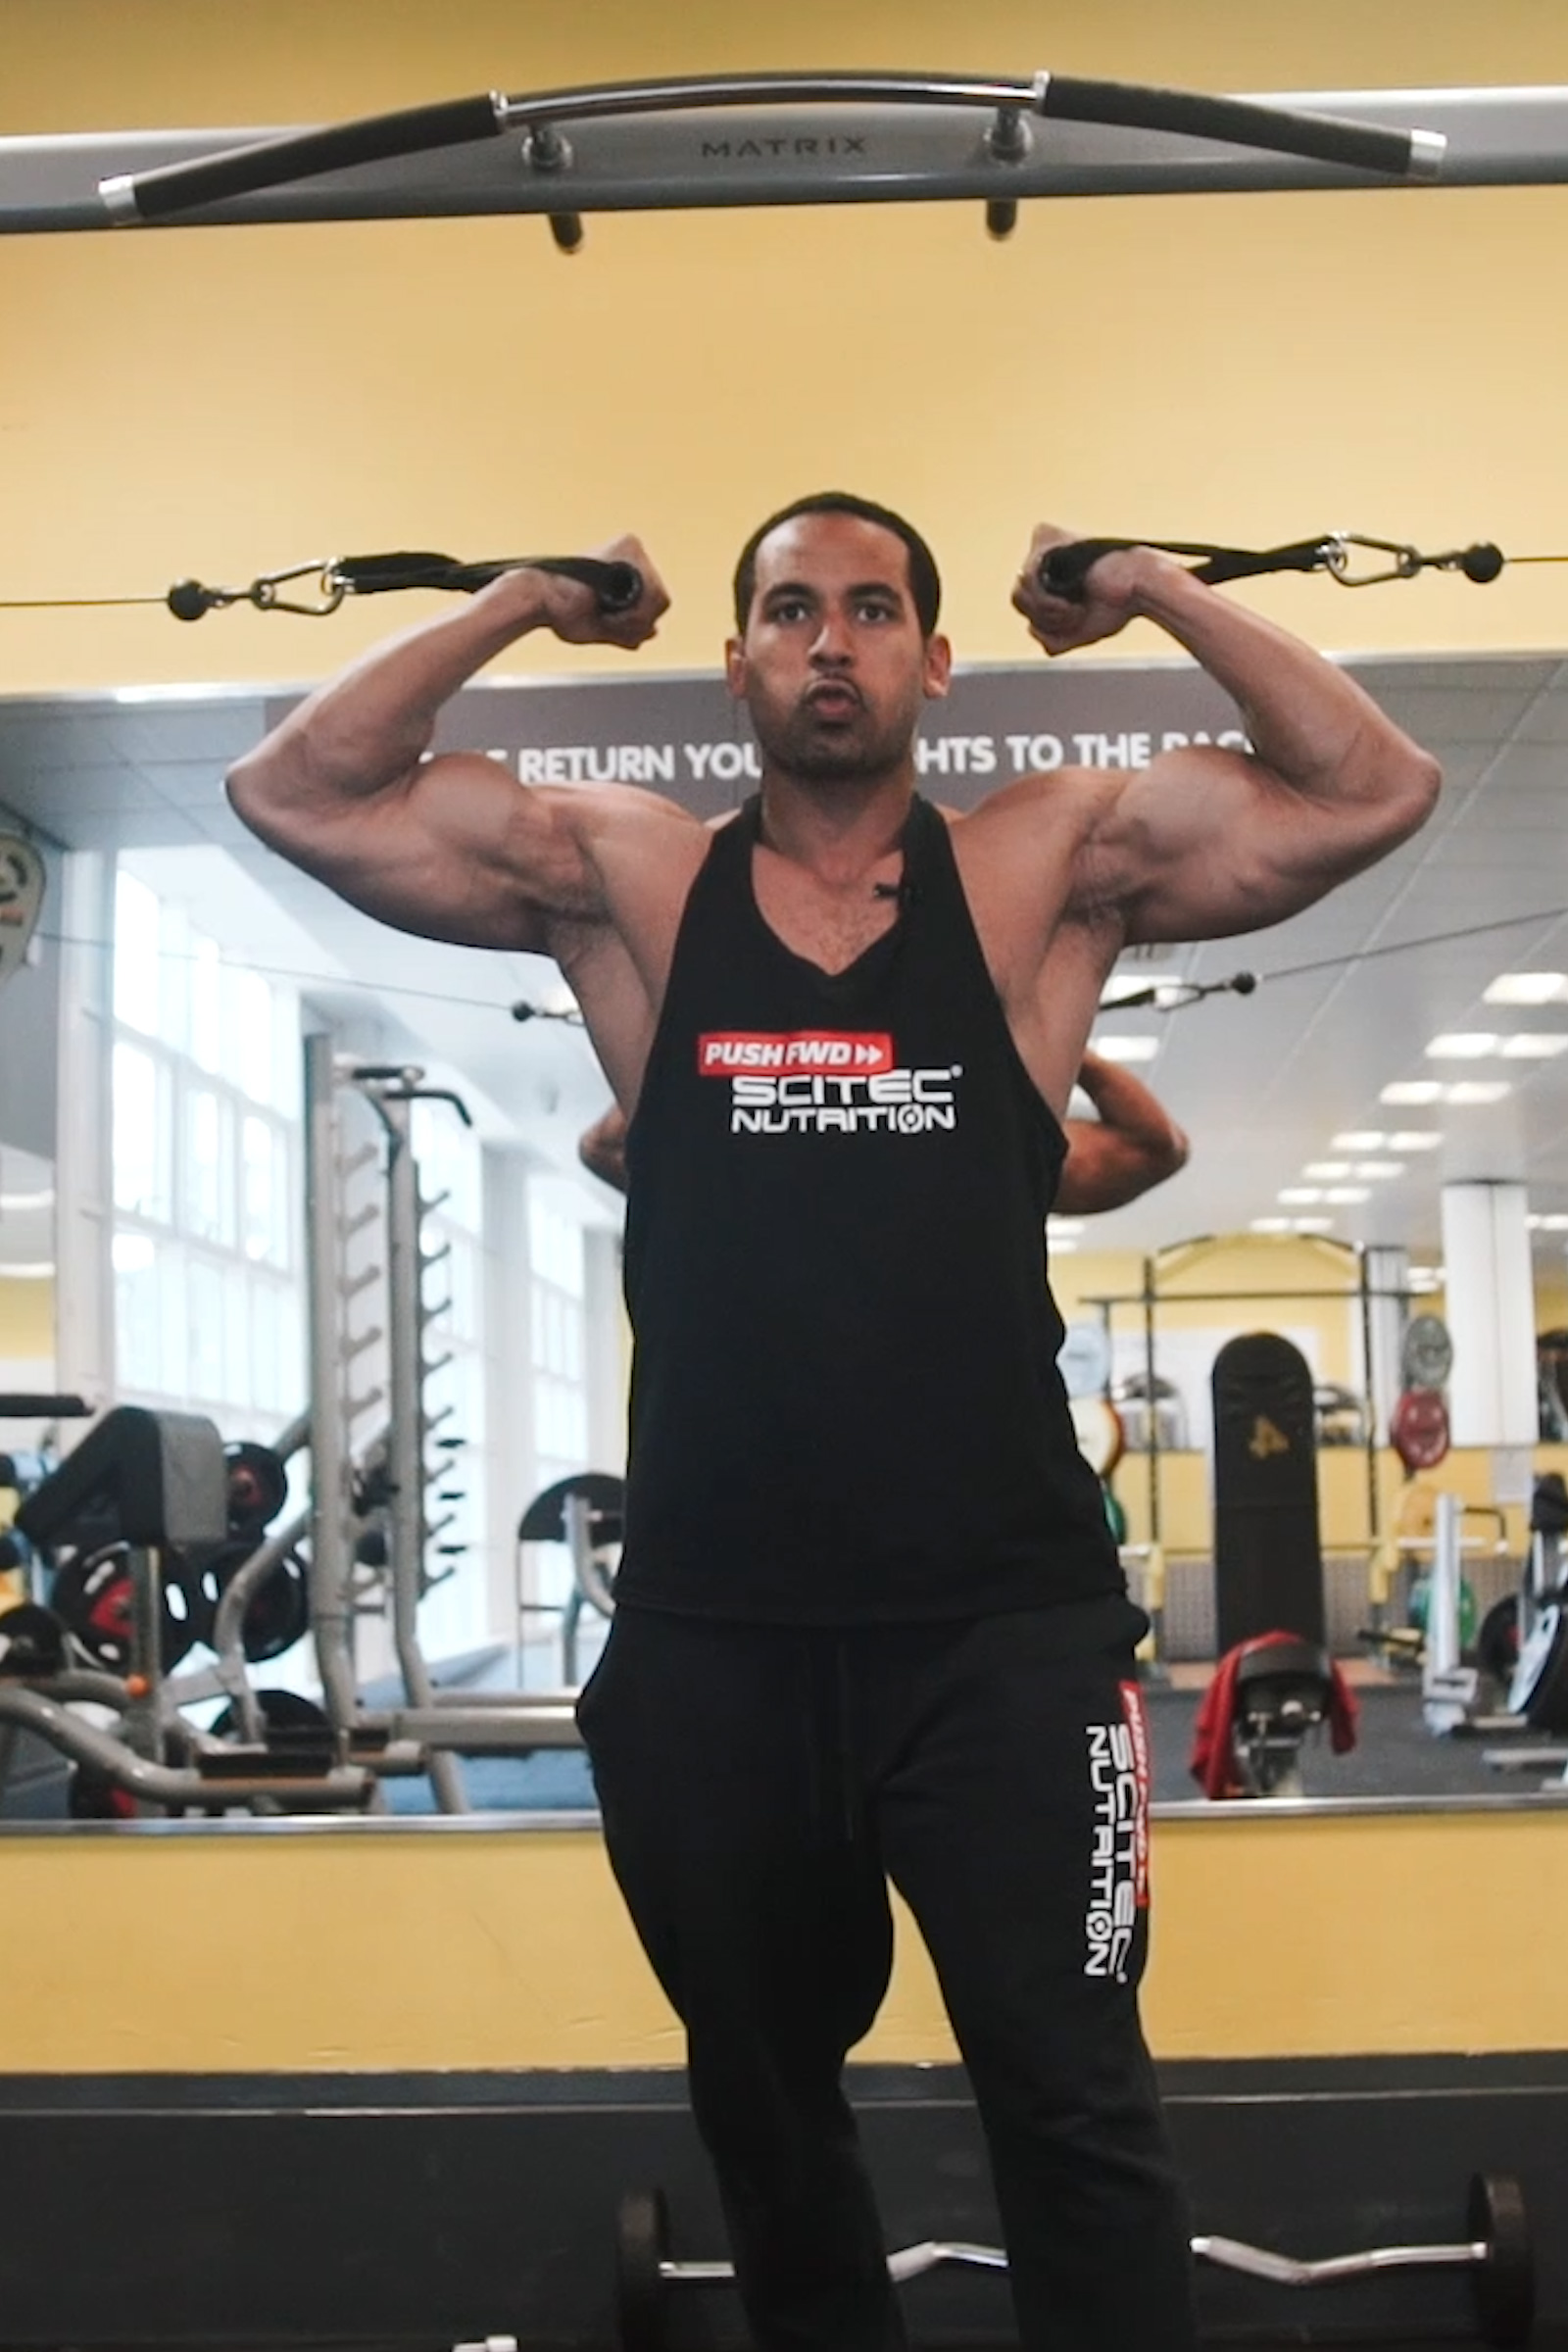 Scitec Nutrition Gym Club